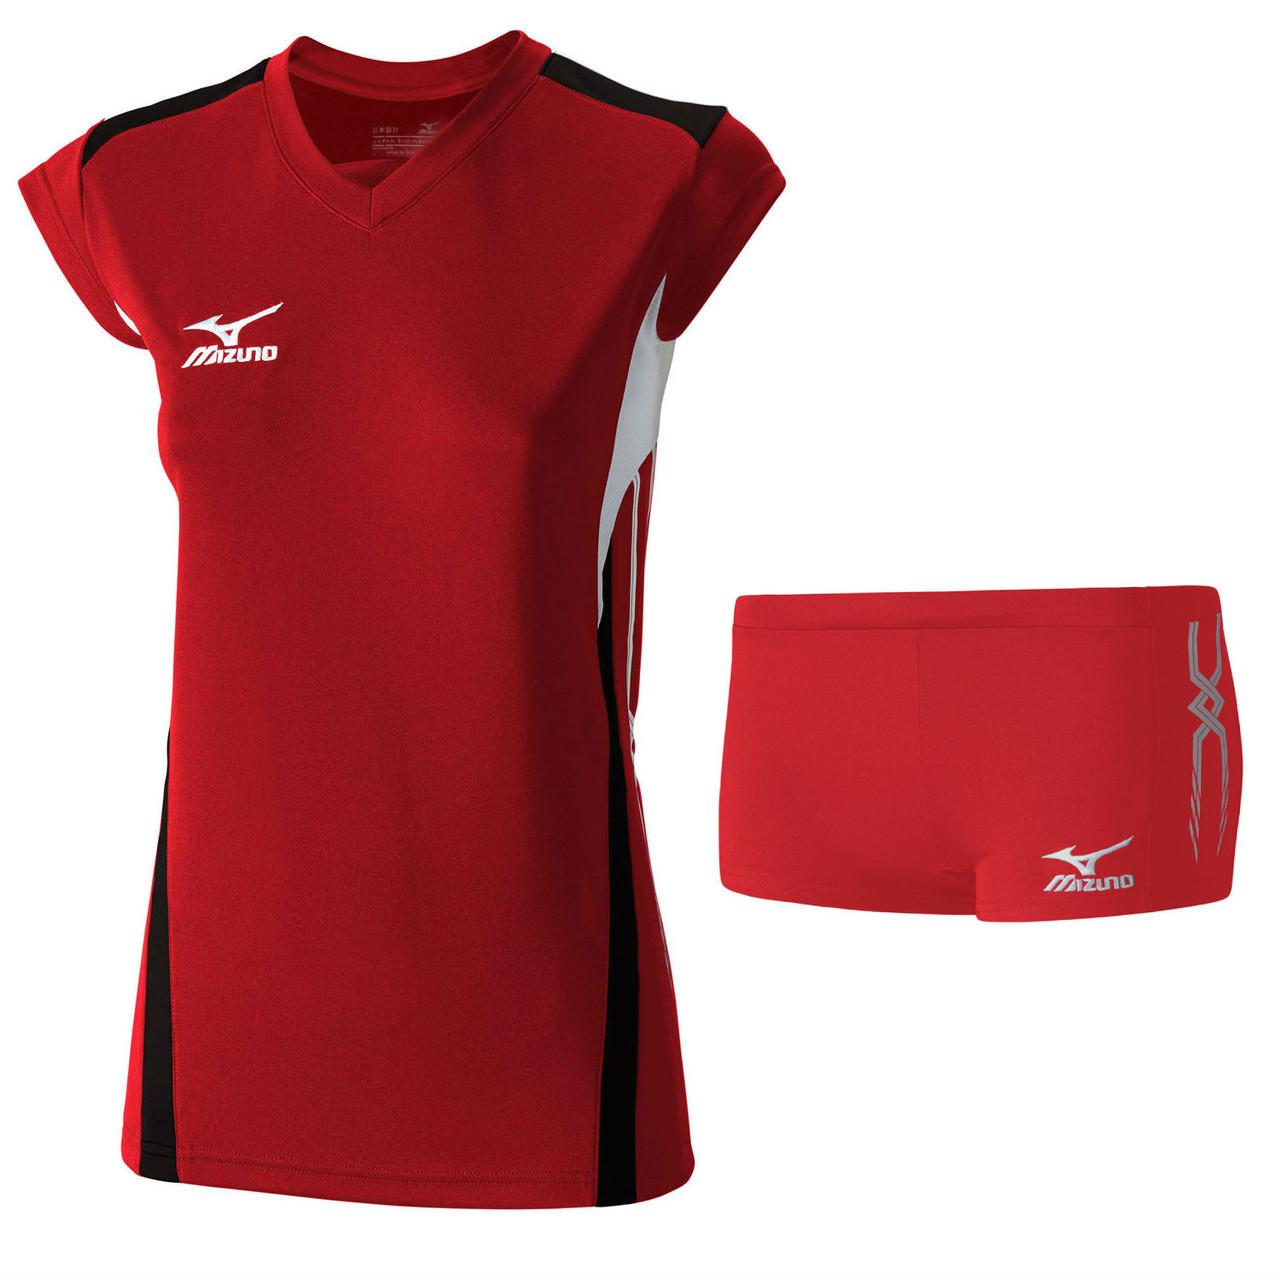 Волейбольная форма Mizuno (футболка W Premium Cap Sleeve V2GA6C20-62+шорты PREMIUM WOMEN'S TIGHTS V2GB6D60-62